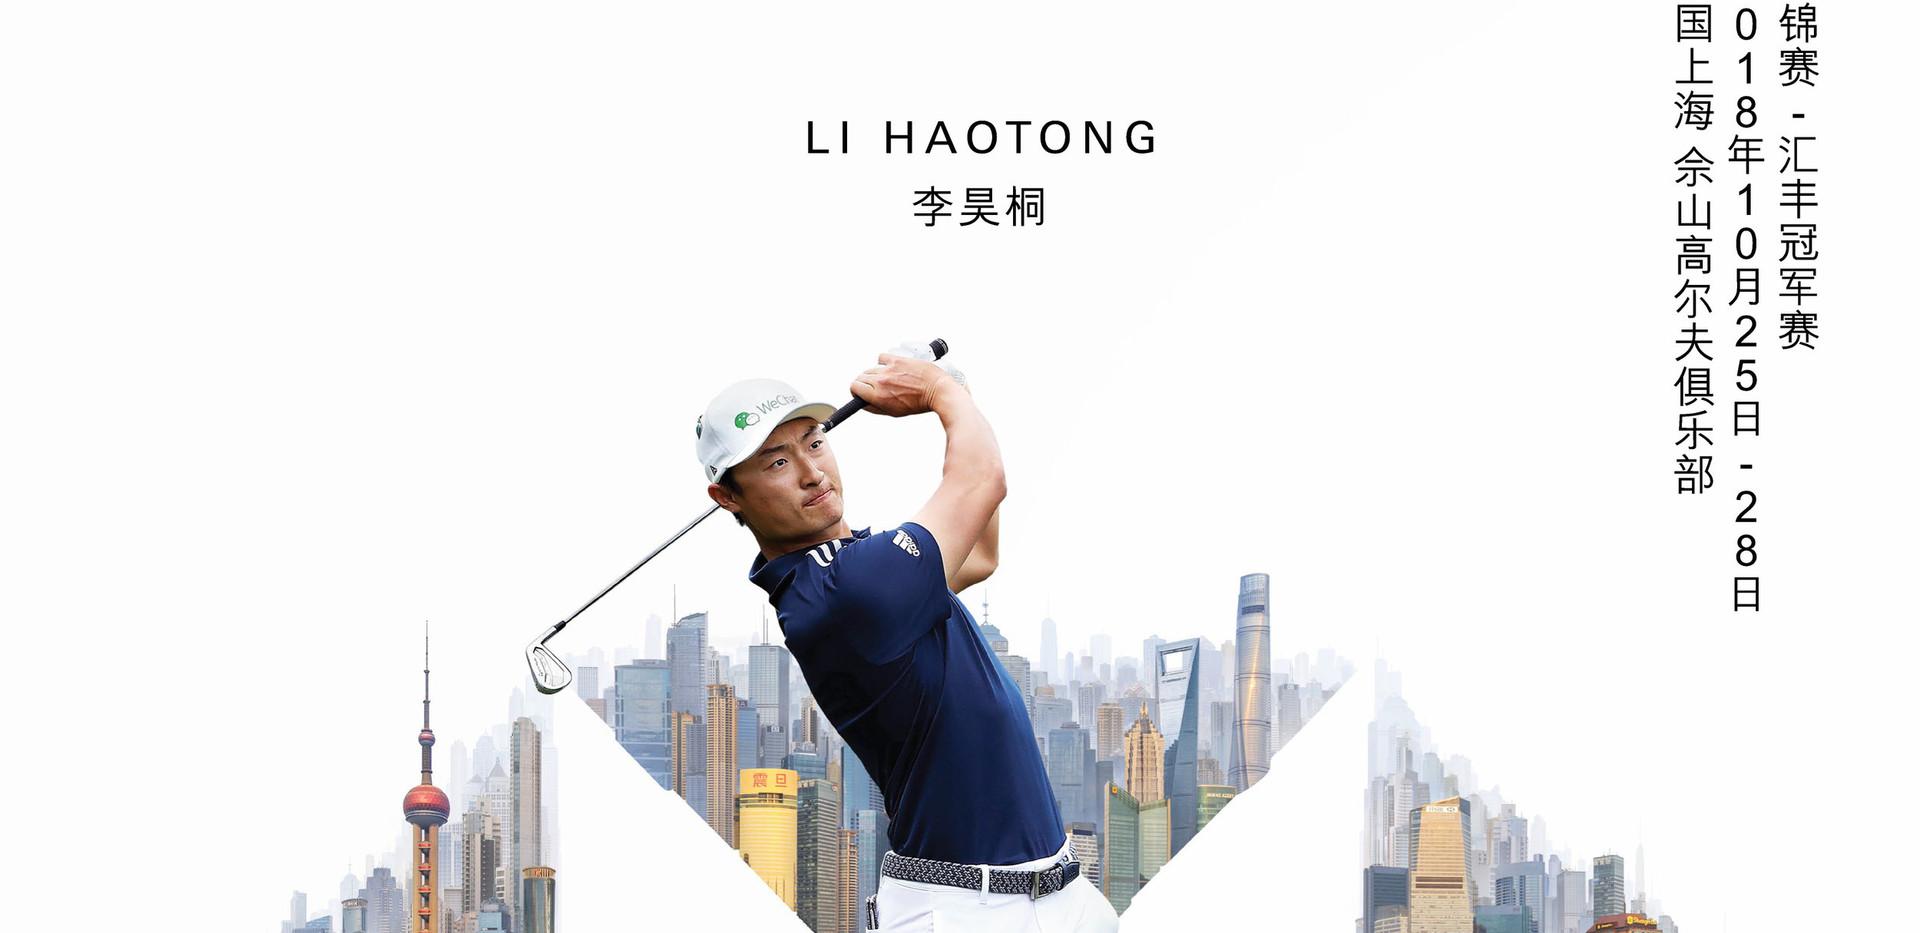 0117_HSBC_China_Golf_6sheet_LI-2 (2).jpg